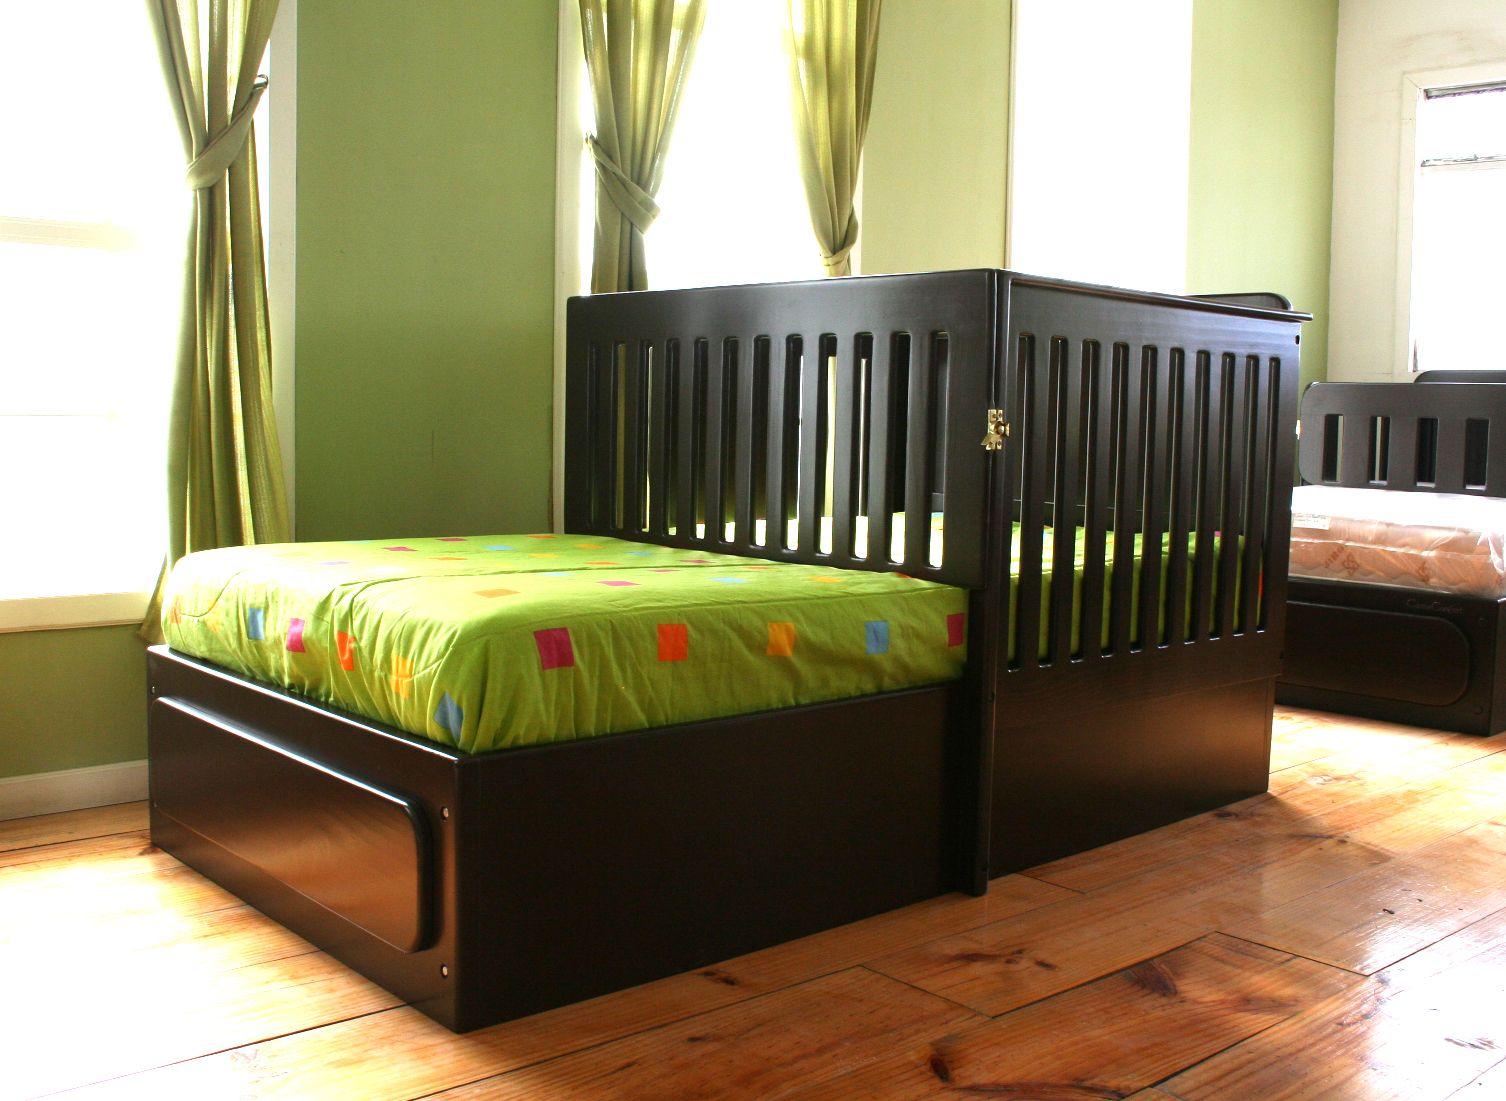 Paquete CUNA-CAMA Cama Confort | bebe | Pinterest | Camas, Cama cuna ...